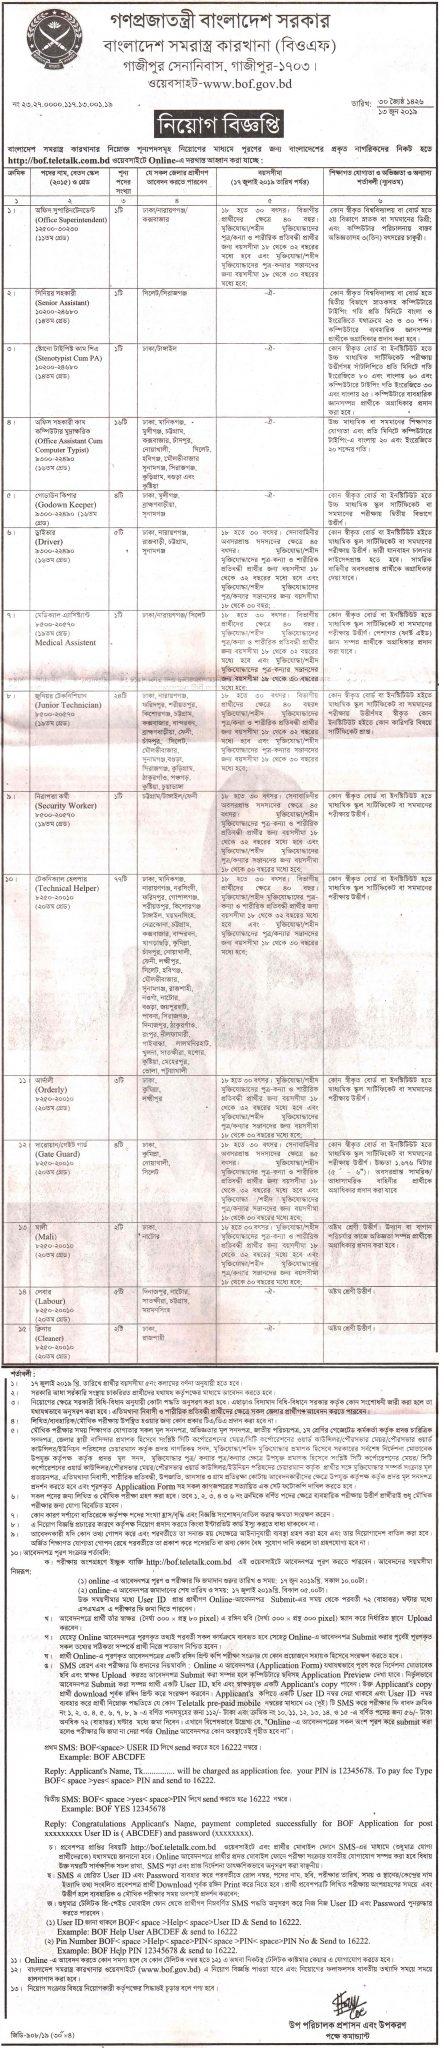 Bangladesh Ordnance Factories (BOF) Job Circular 2019